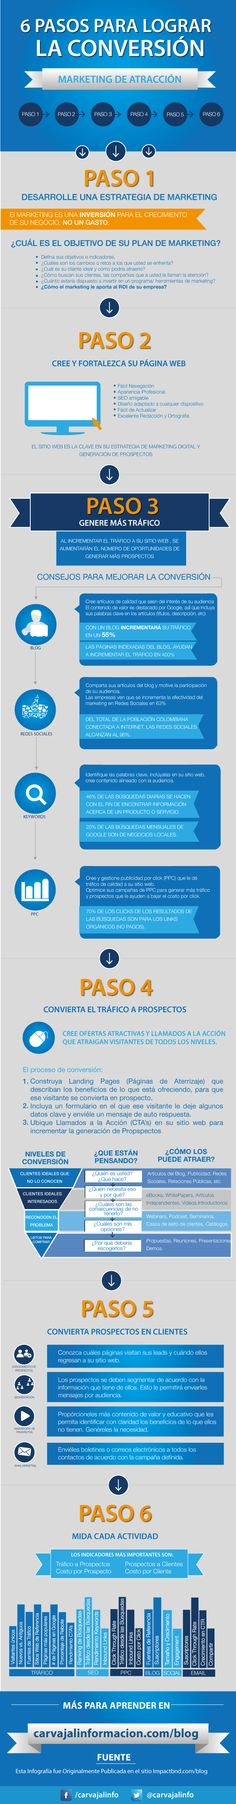 6 pasos para lograr la conversión. #infografia #socialmedia